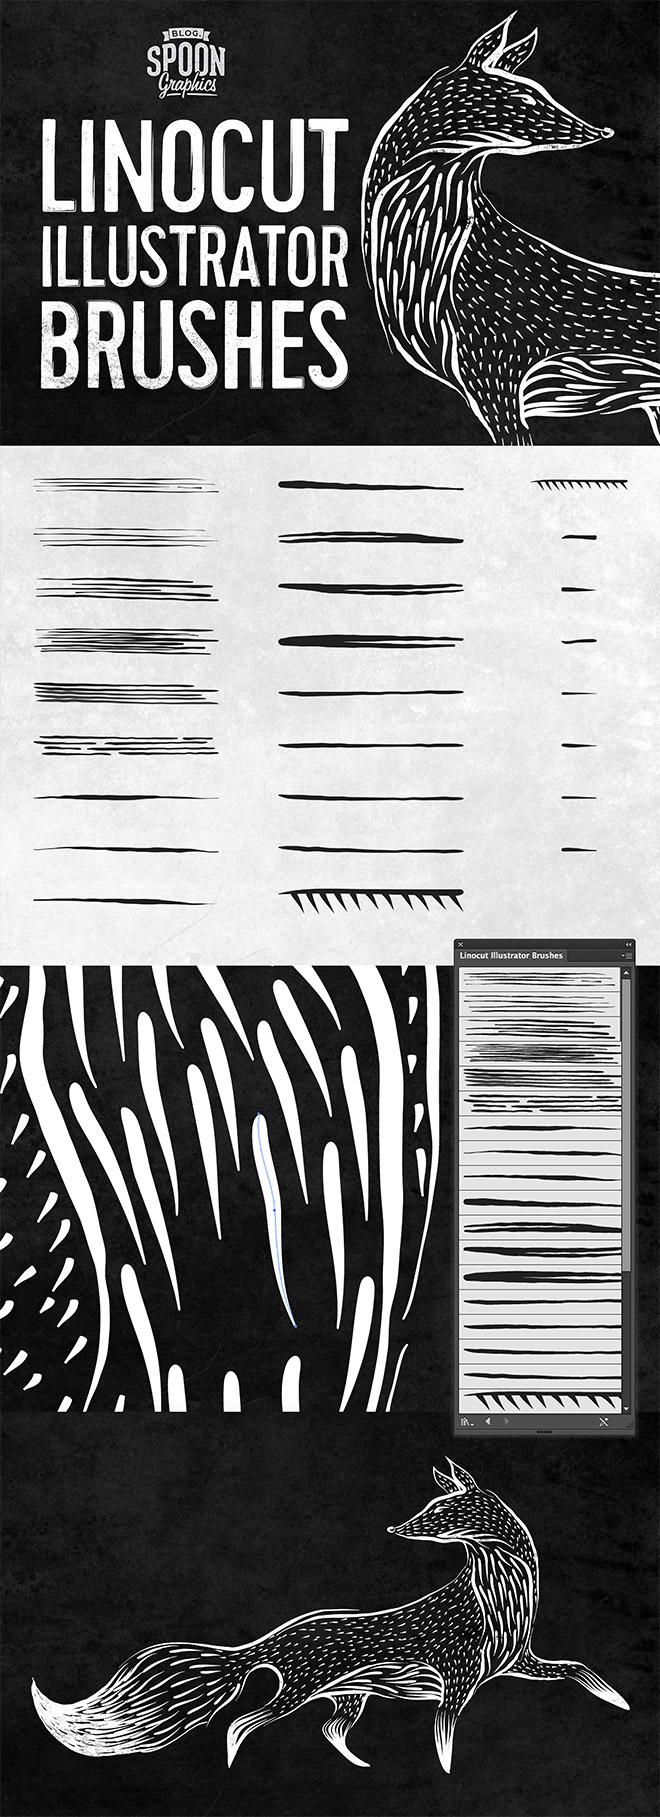 25 Free Linocut & Woodcut Brushes for Adobe Illustrator